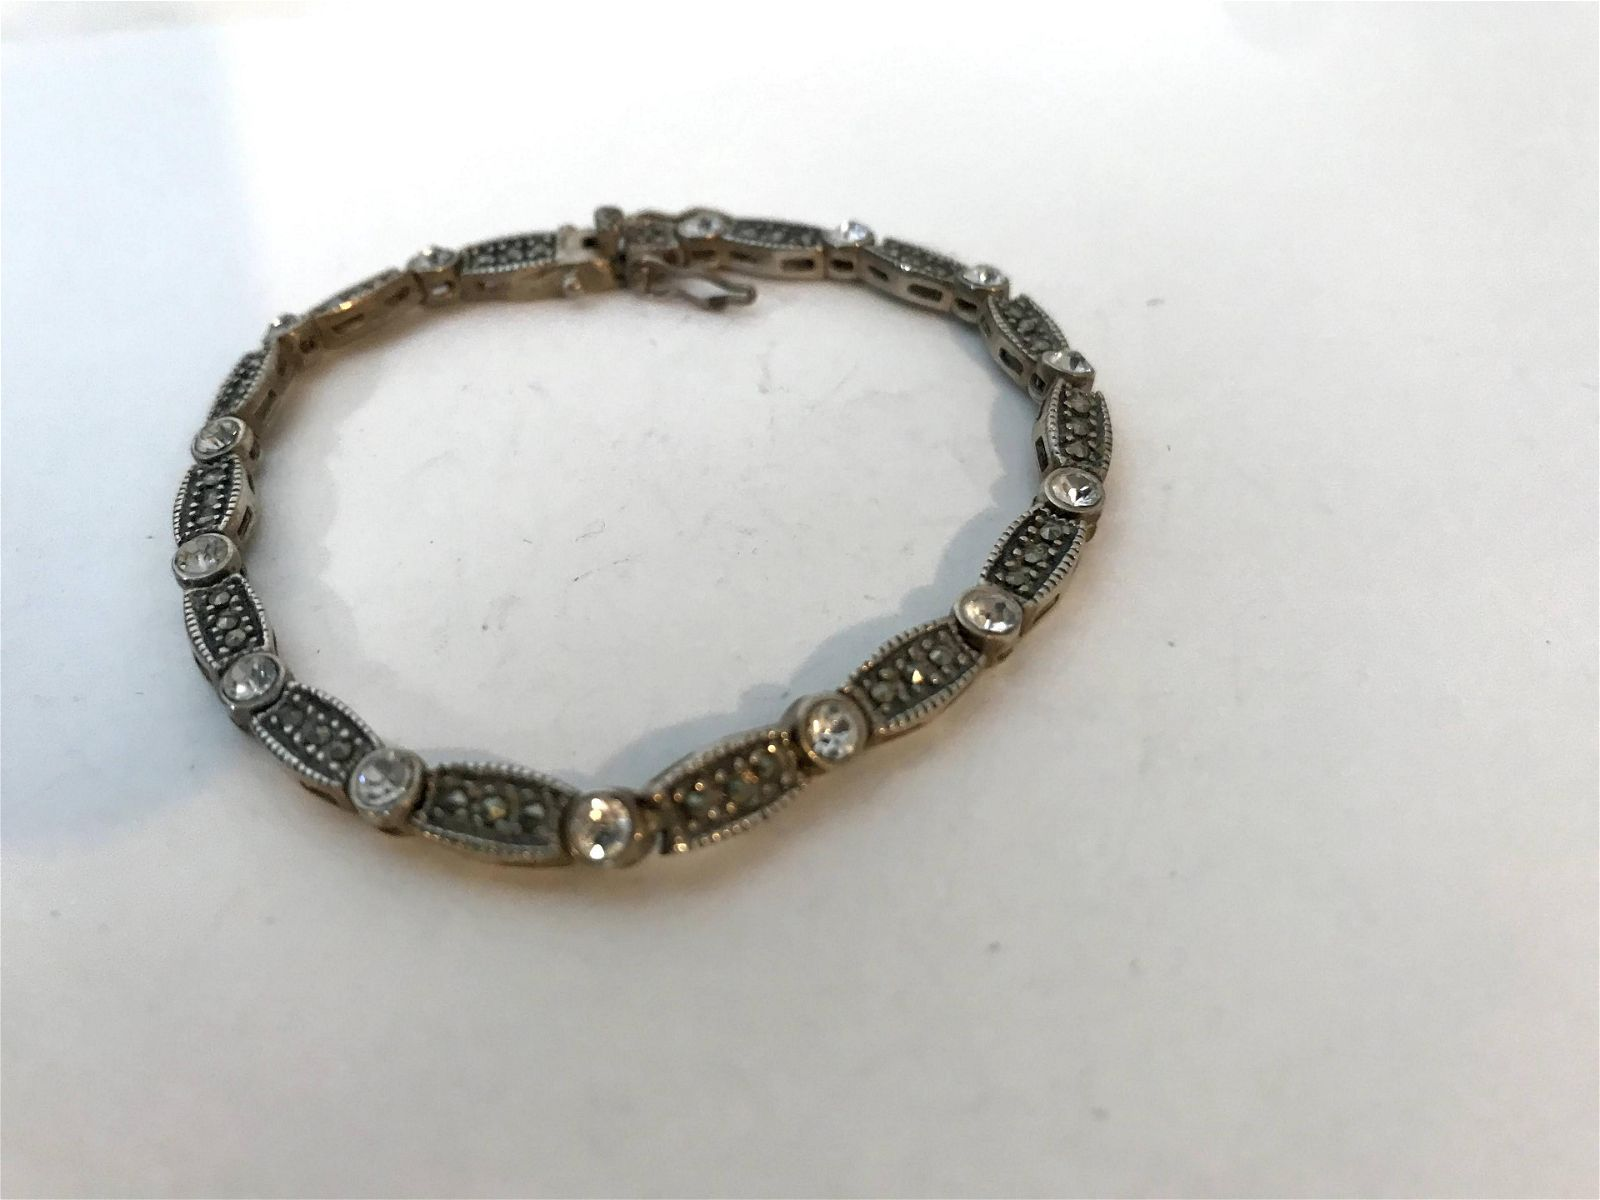 Antique Vintage Art Deco Style Sterling Silver